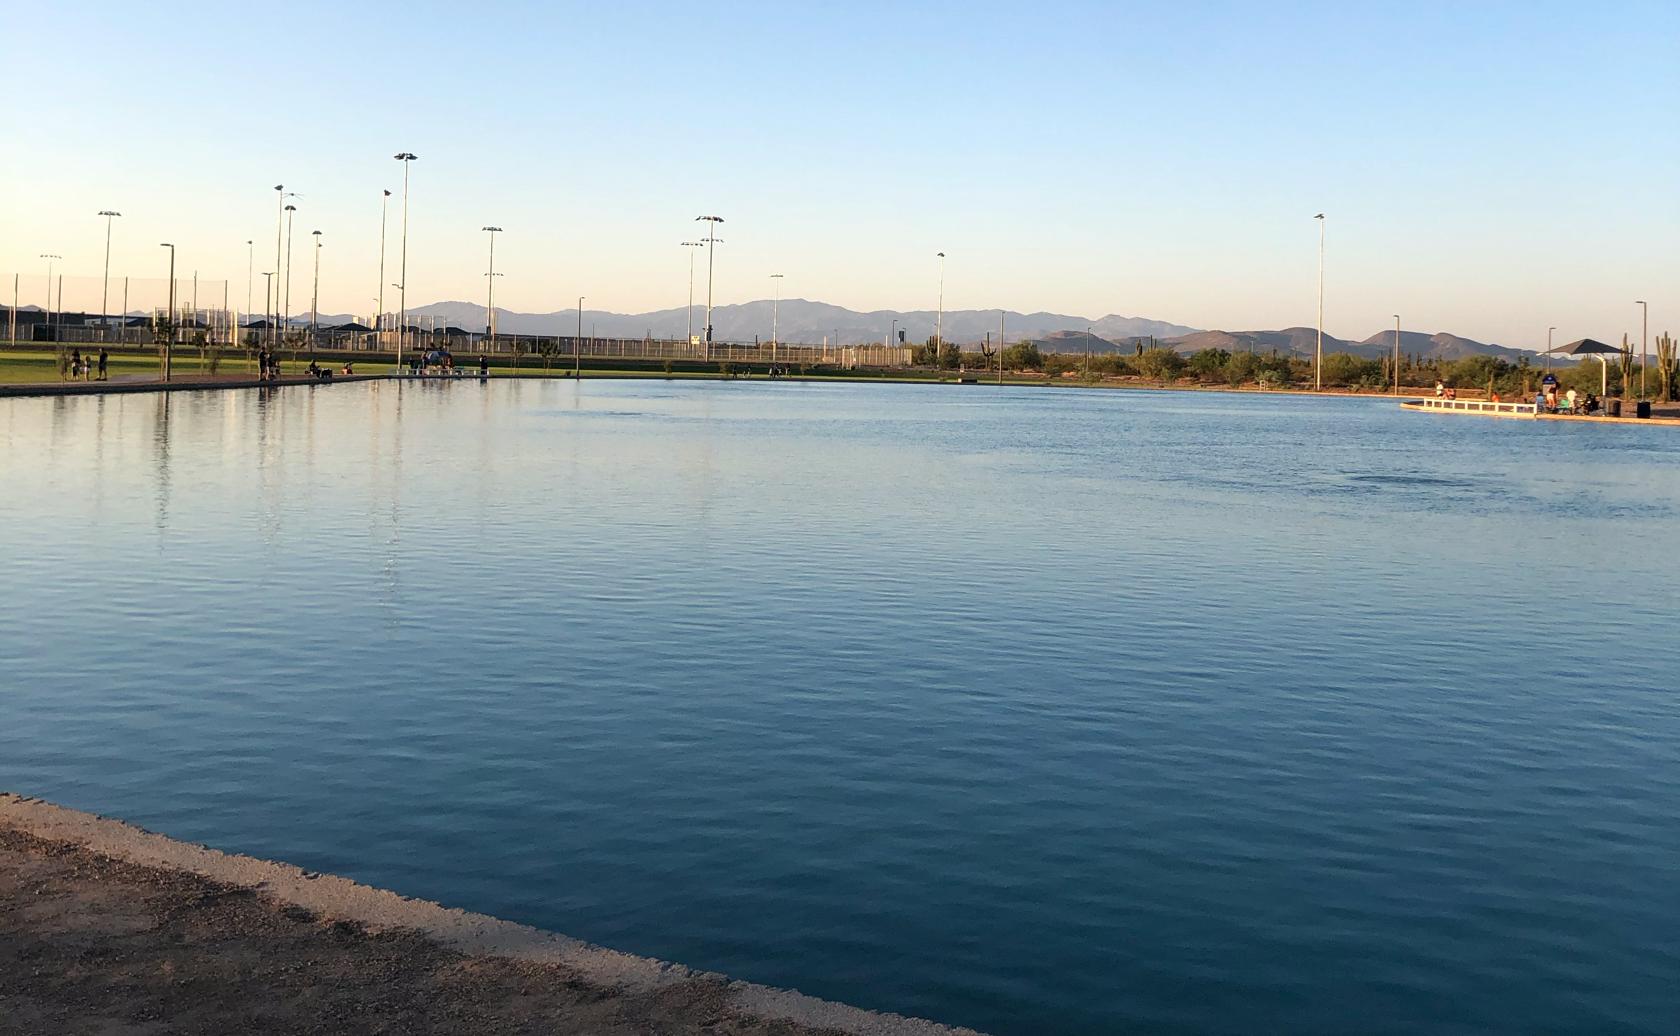 Paloma-Community-Lake-Fishing-Guide-Peoria-AZ-05